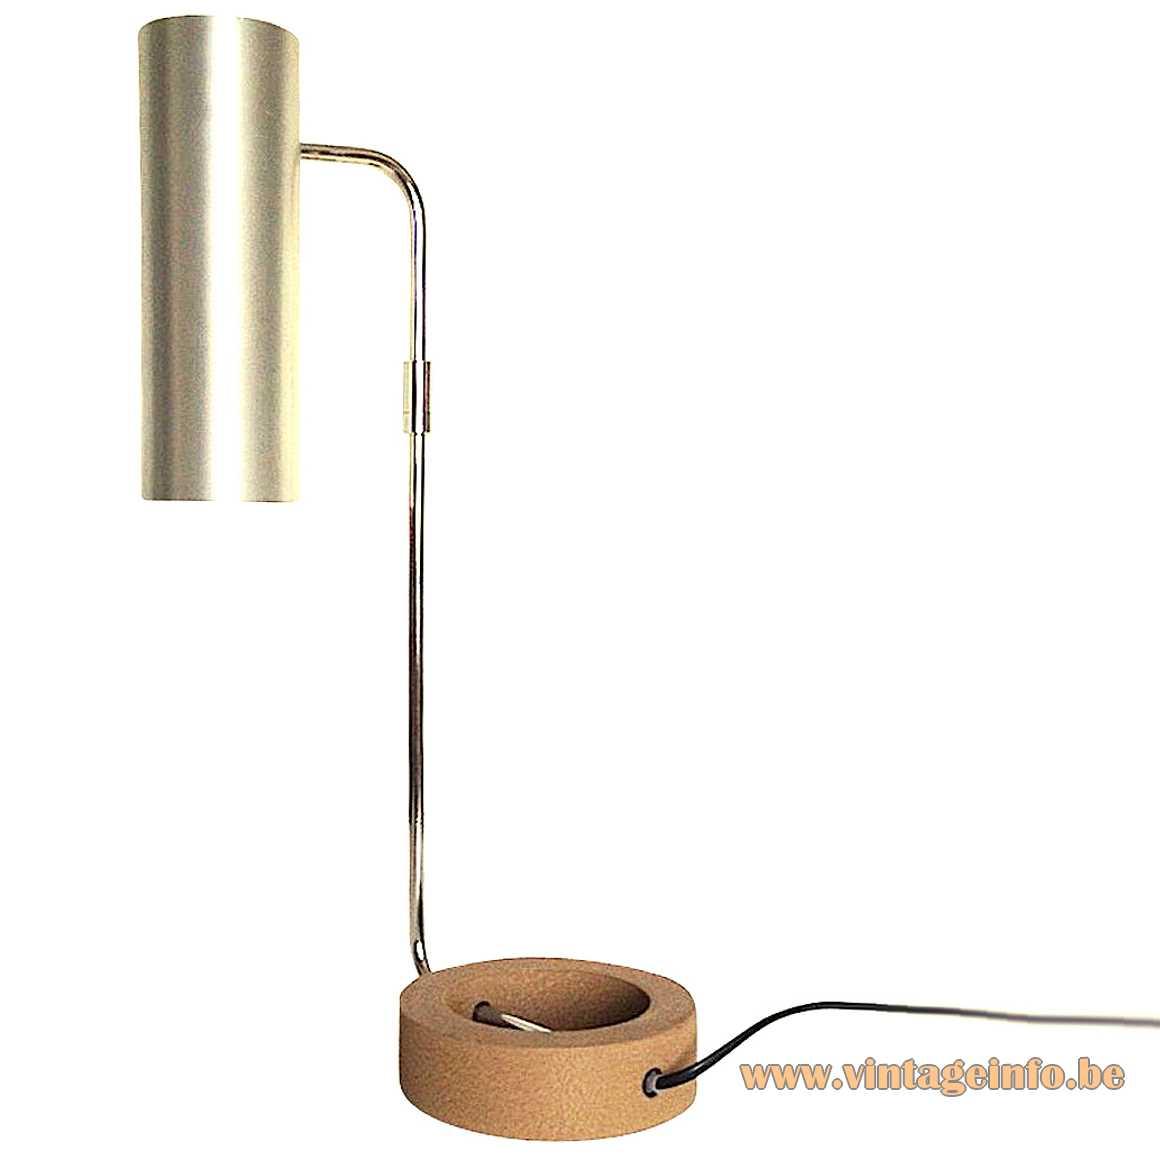 Rico Baltensweiler cast iron circle desk lamp 1960s 1970 Swisterland Rosmarie Schwarz MCM